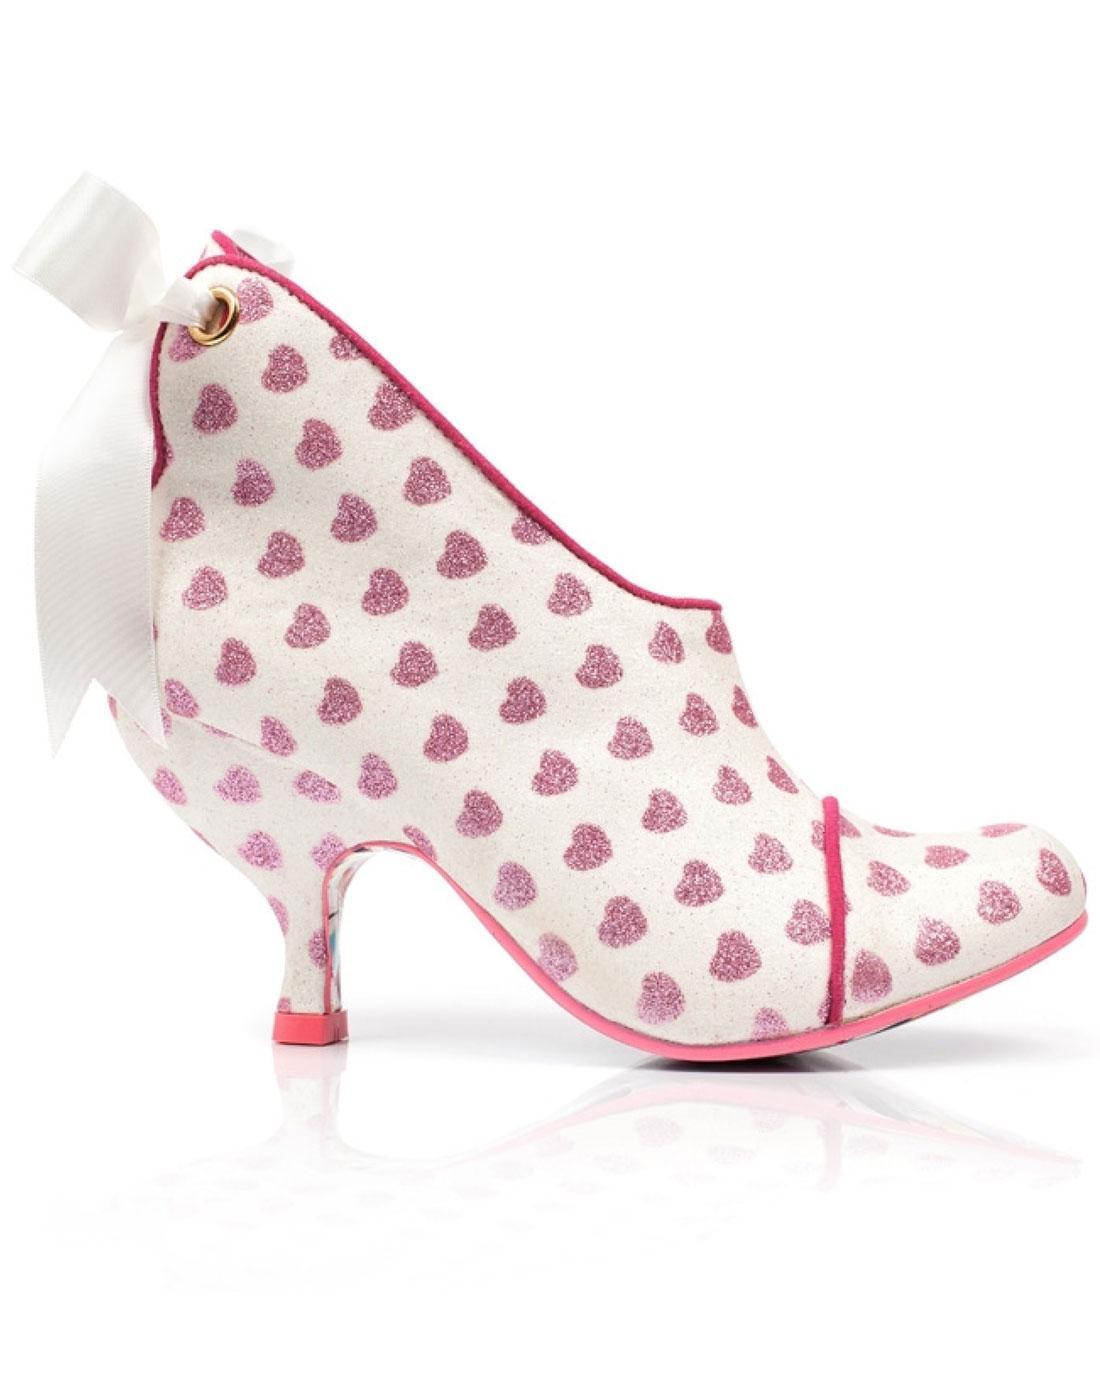 Irregular Around Choice Heeled Love Boots Is All Heart rIrxUSq4w